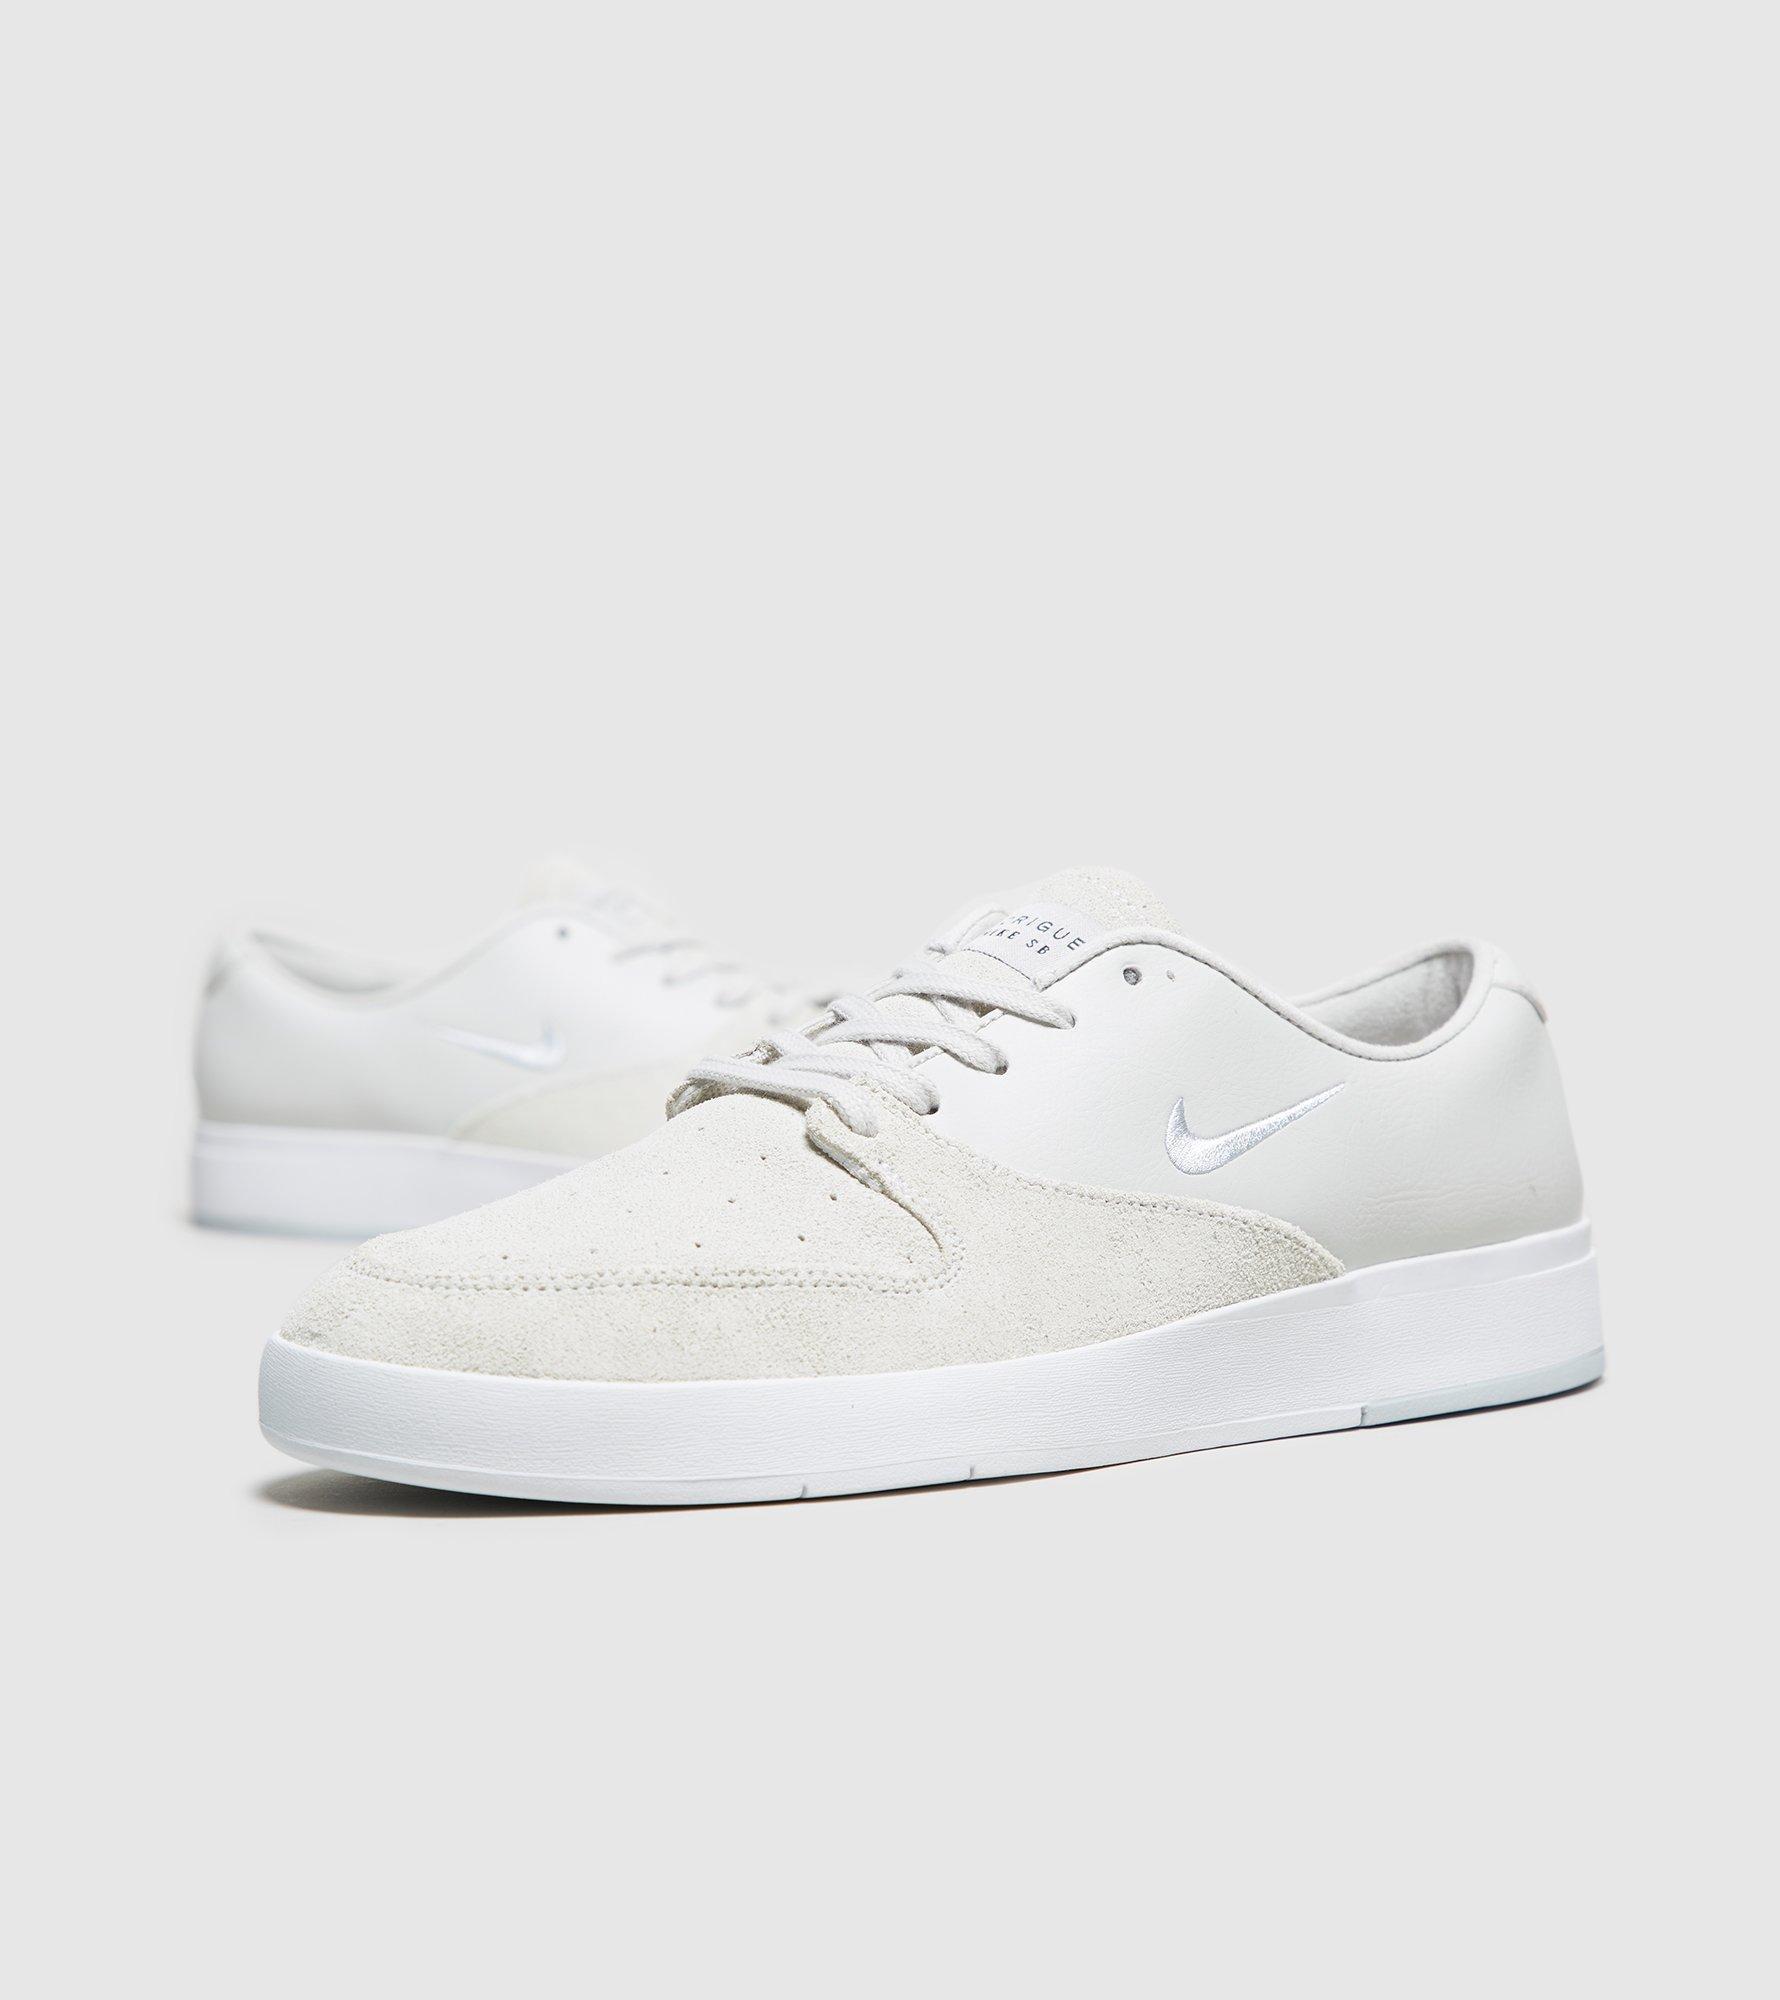 Nike. Men's White Paul Rodriguez X